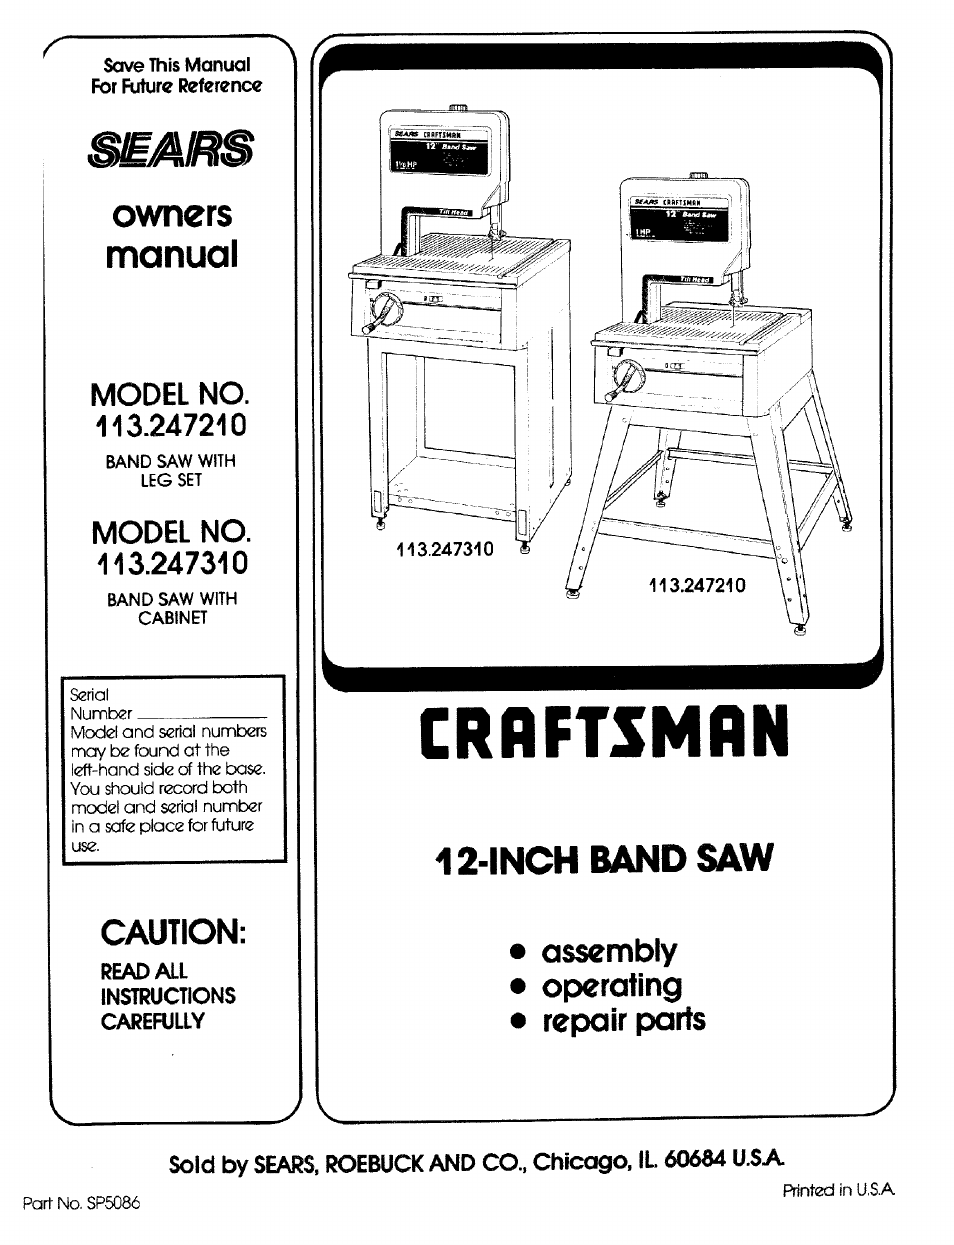 Craftsman Band Saw Wiring Diagram Garage Opener 113 2472t0 User Manual 40 Pages Rh Manualsdir Com Lt4000 Mower